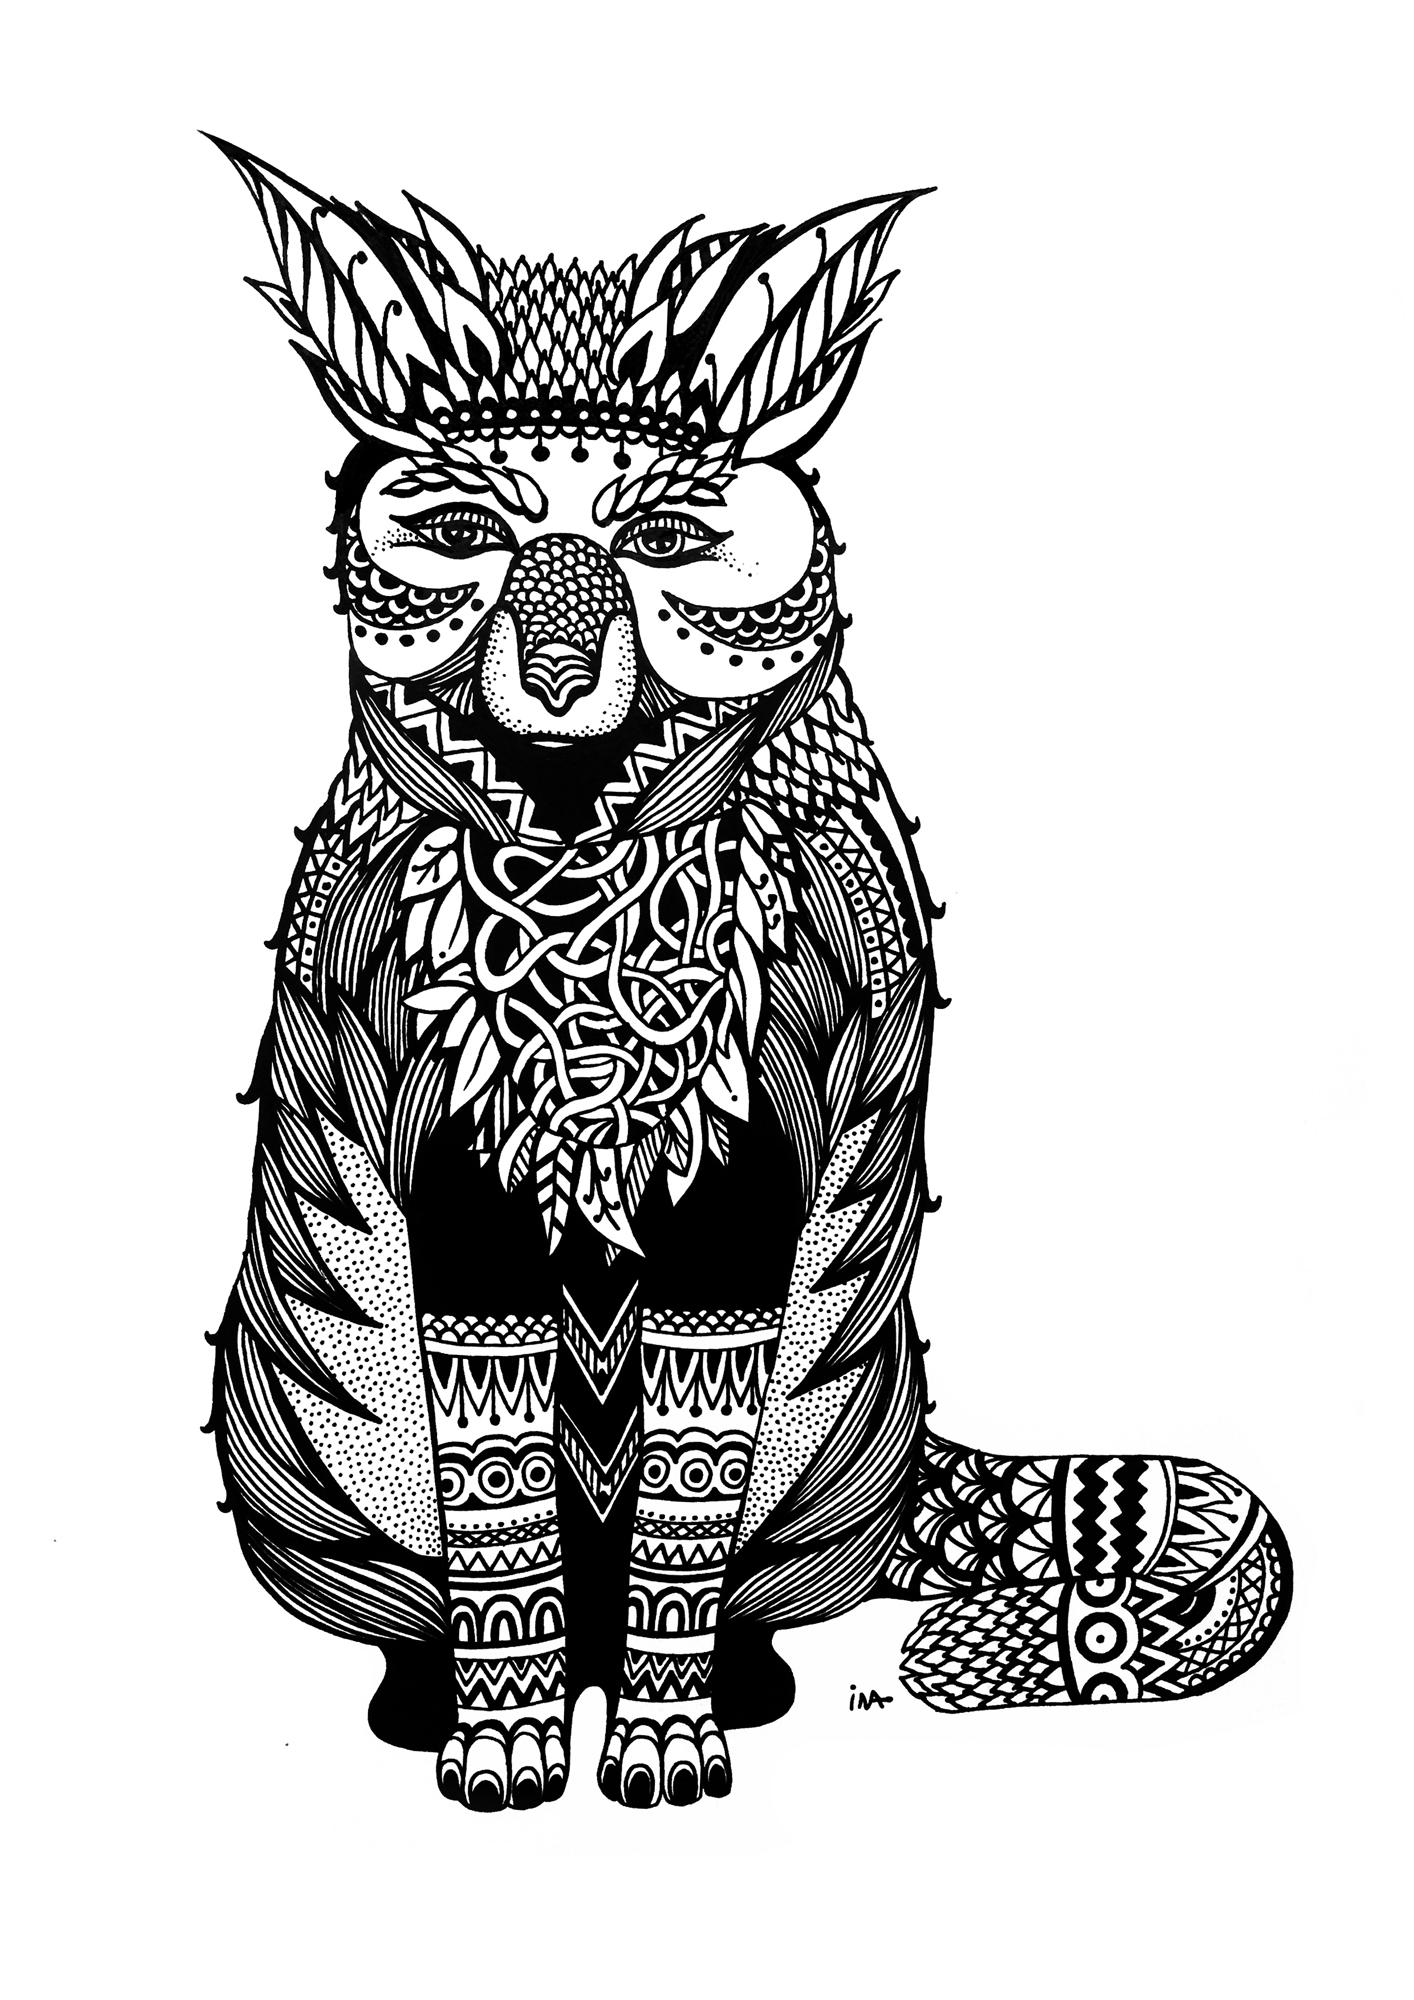 Ina Prodanova | Fox | Print reproduction of ink drawing | 21x30cm | £35